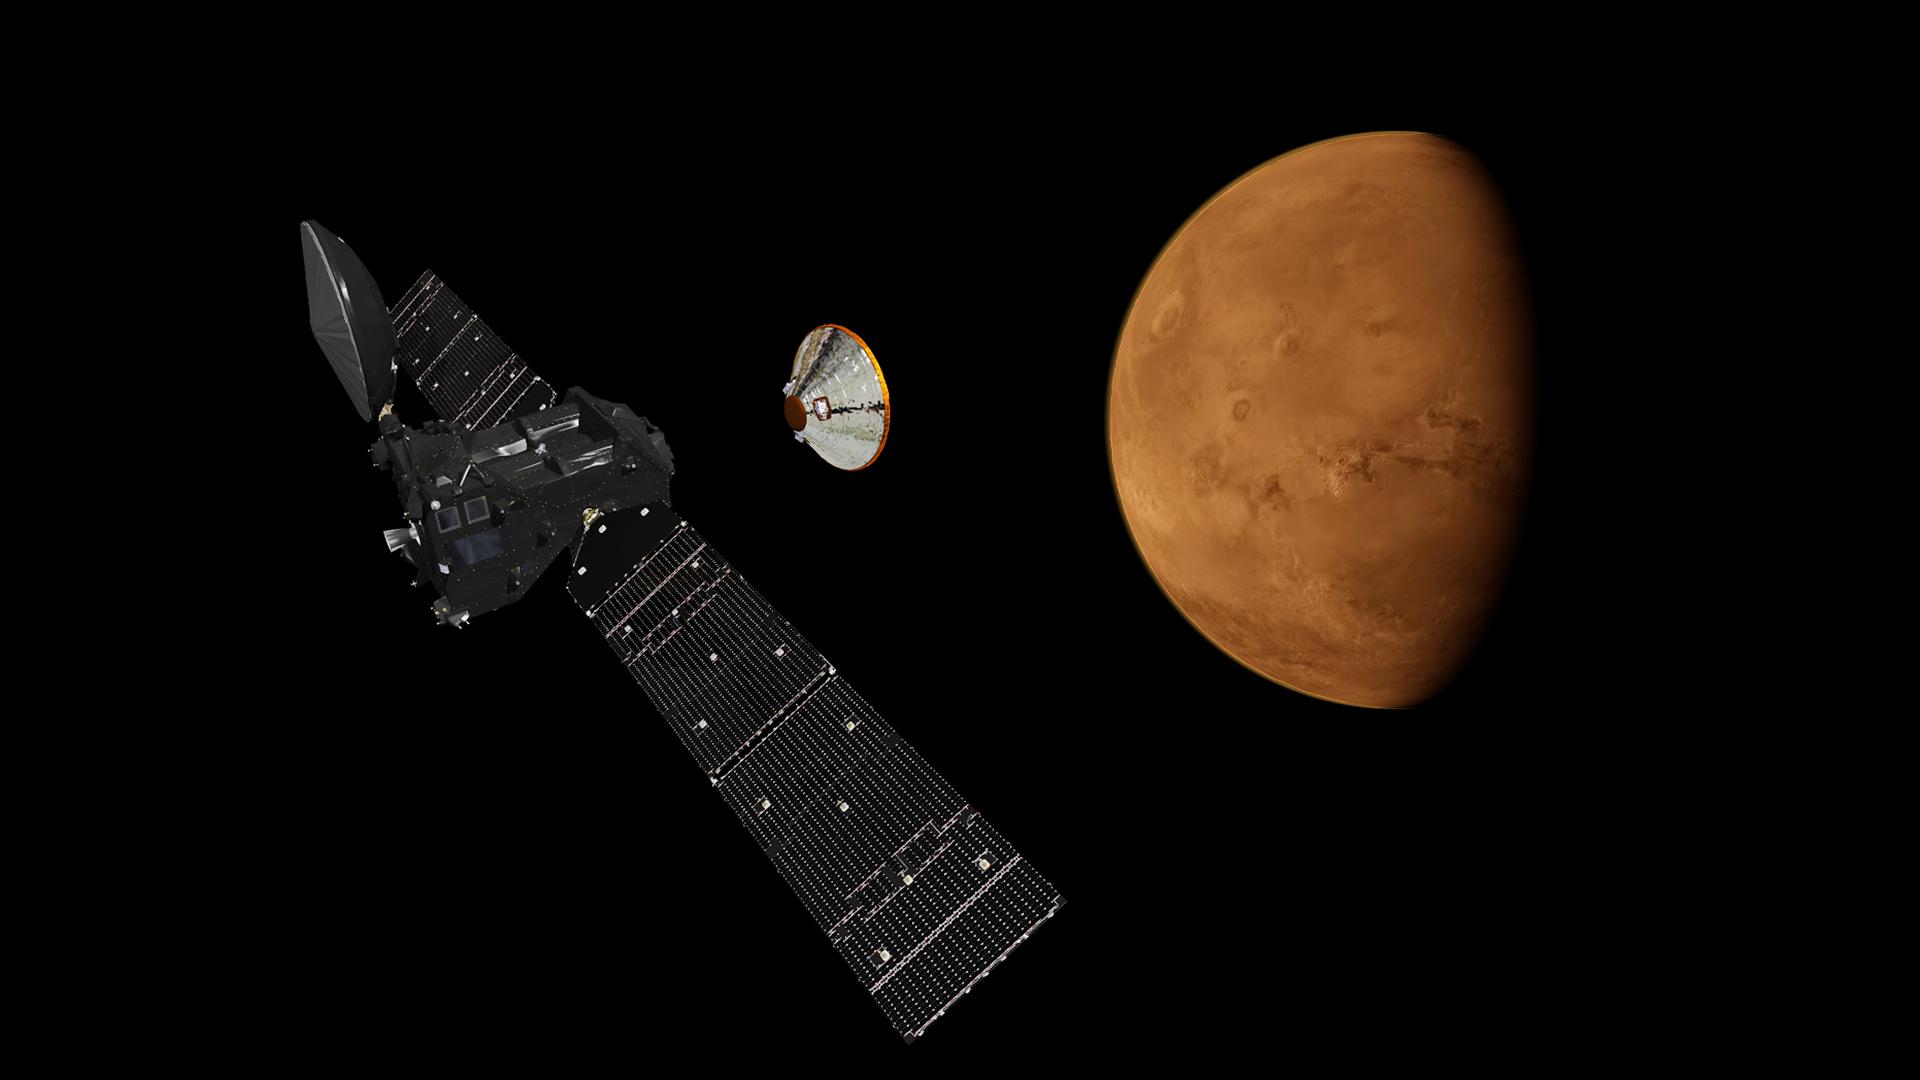 ExoMars' Trace Gas Orbiter and Schiaparelli Lander